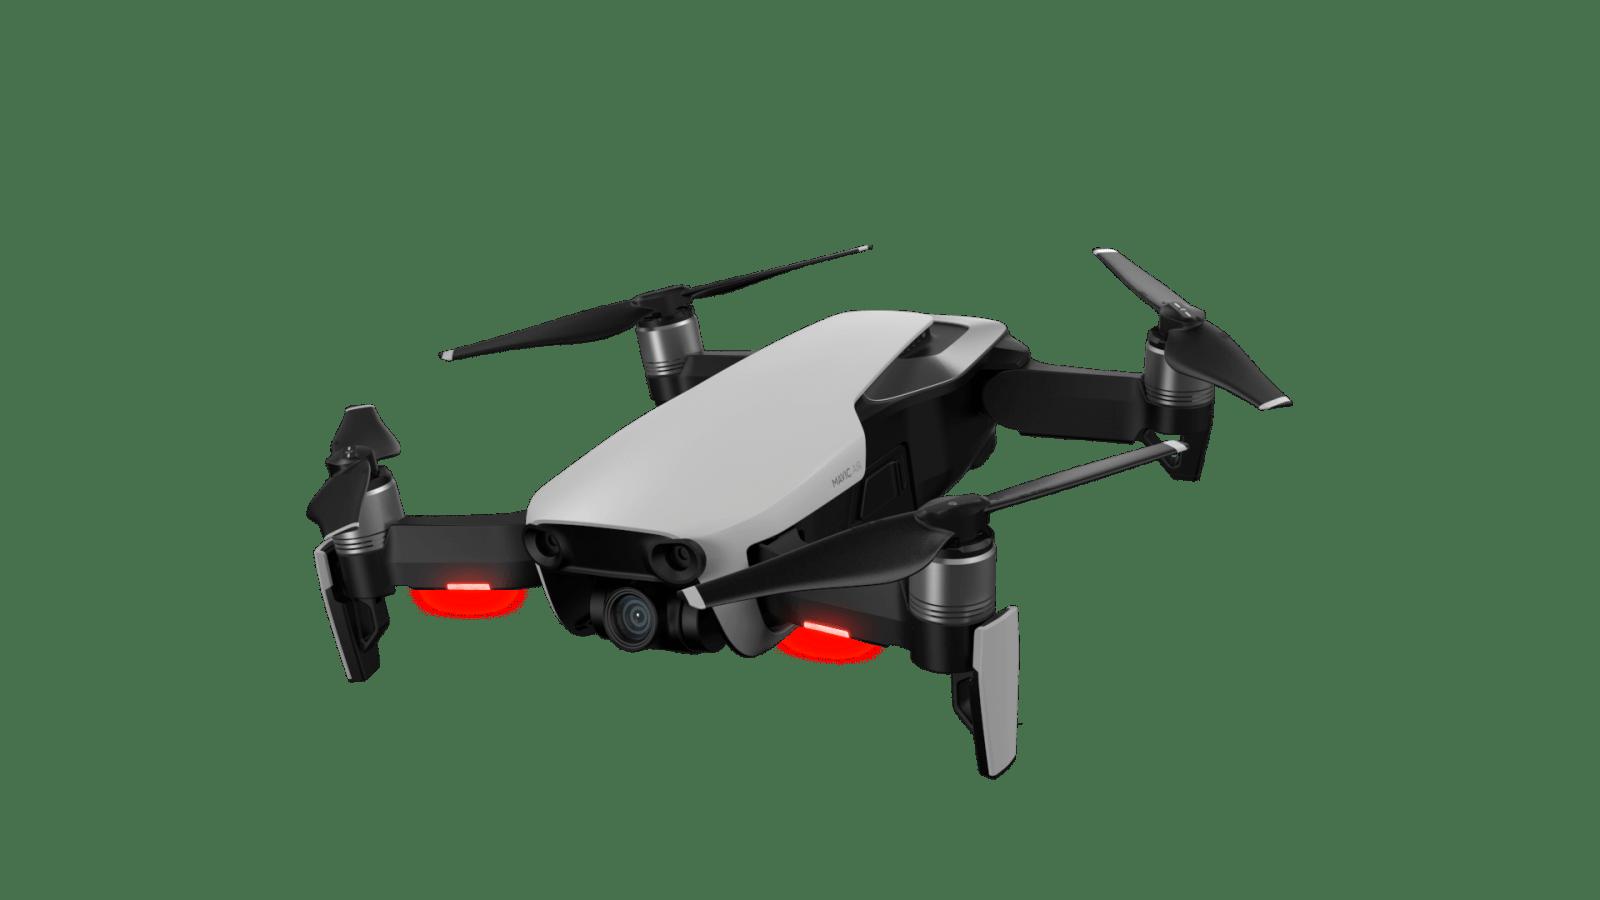 Dji Mavic Air Drone transparent PNG.